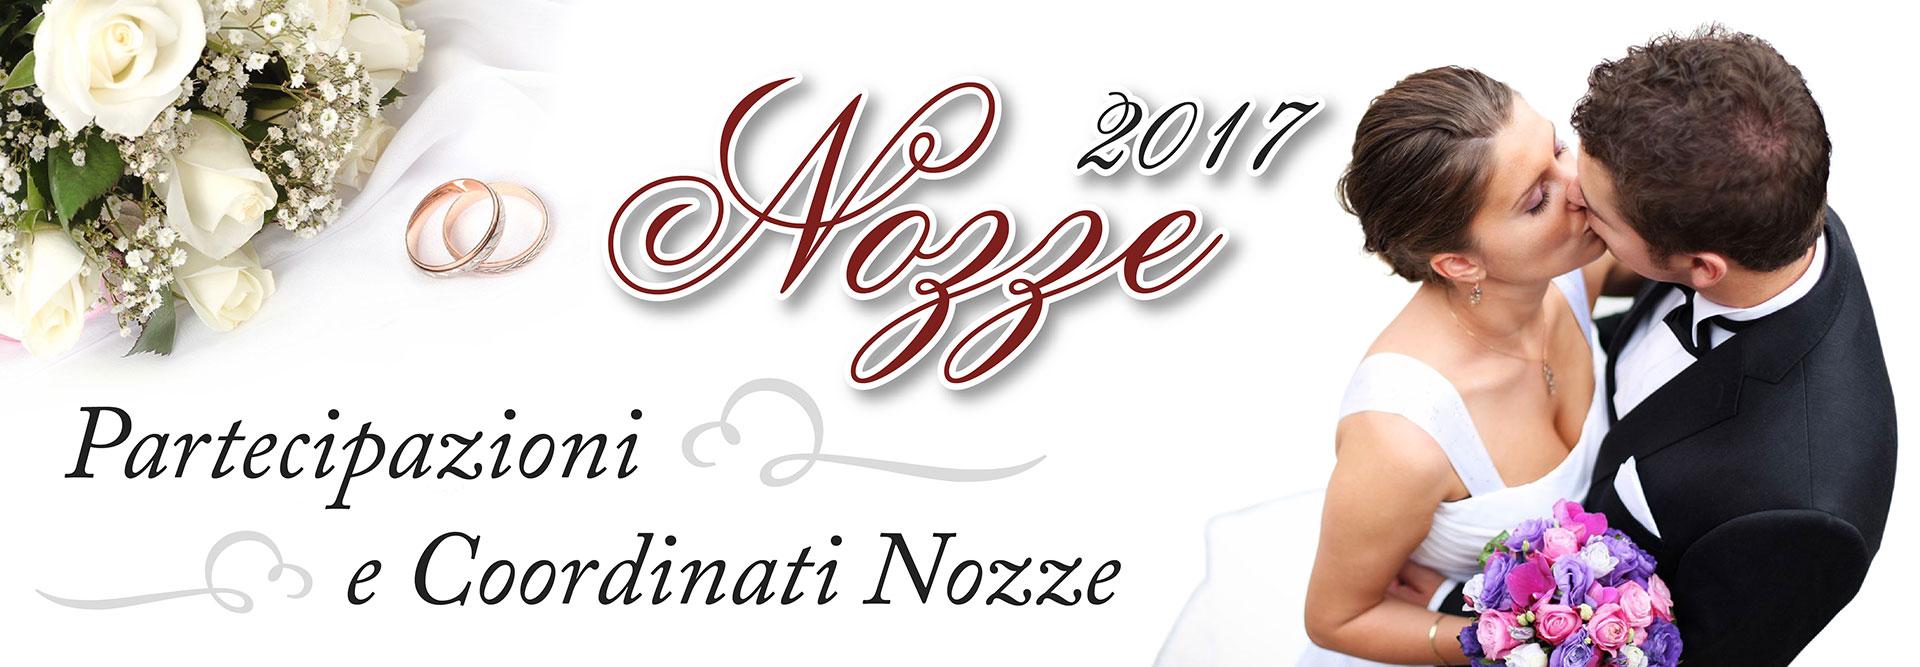 Banner-Nozze-2017